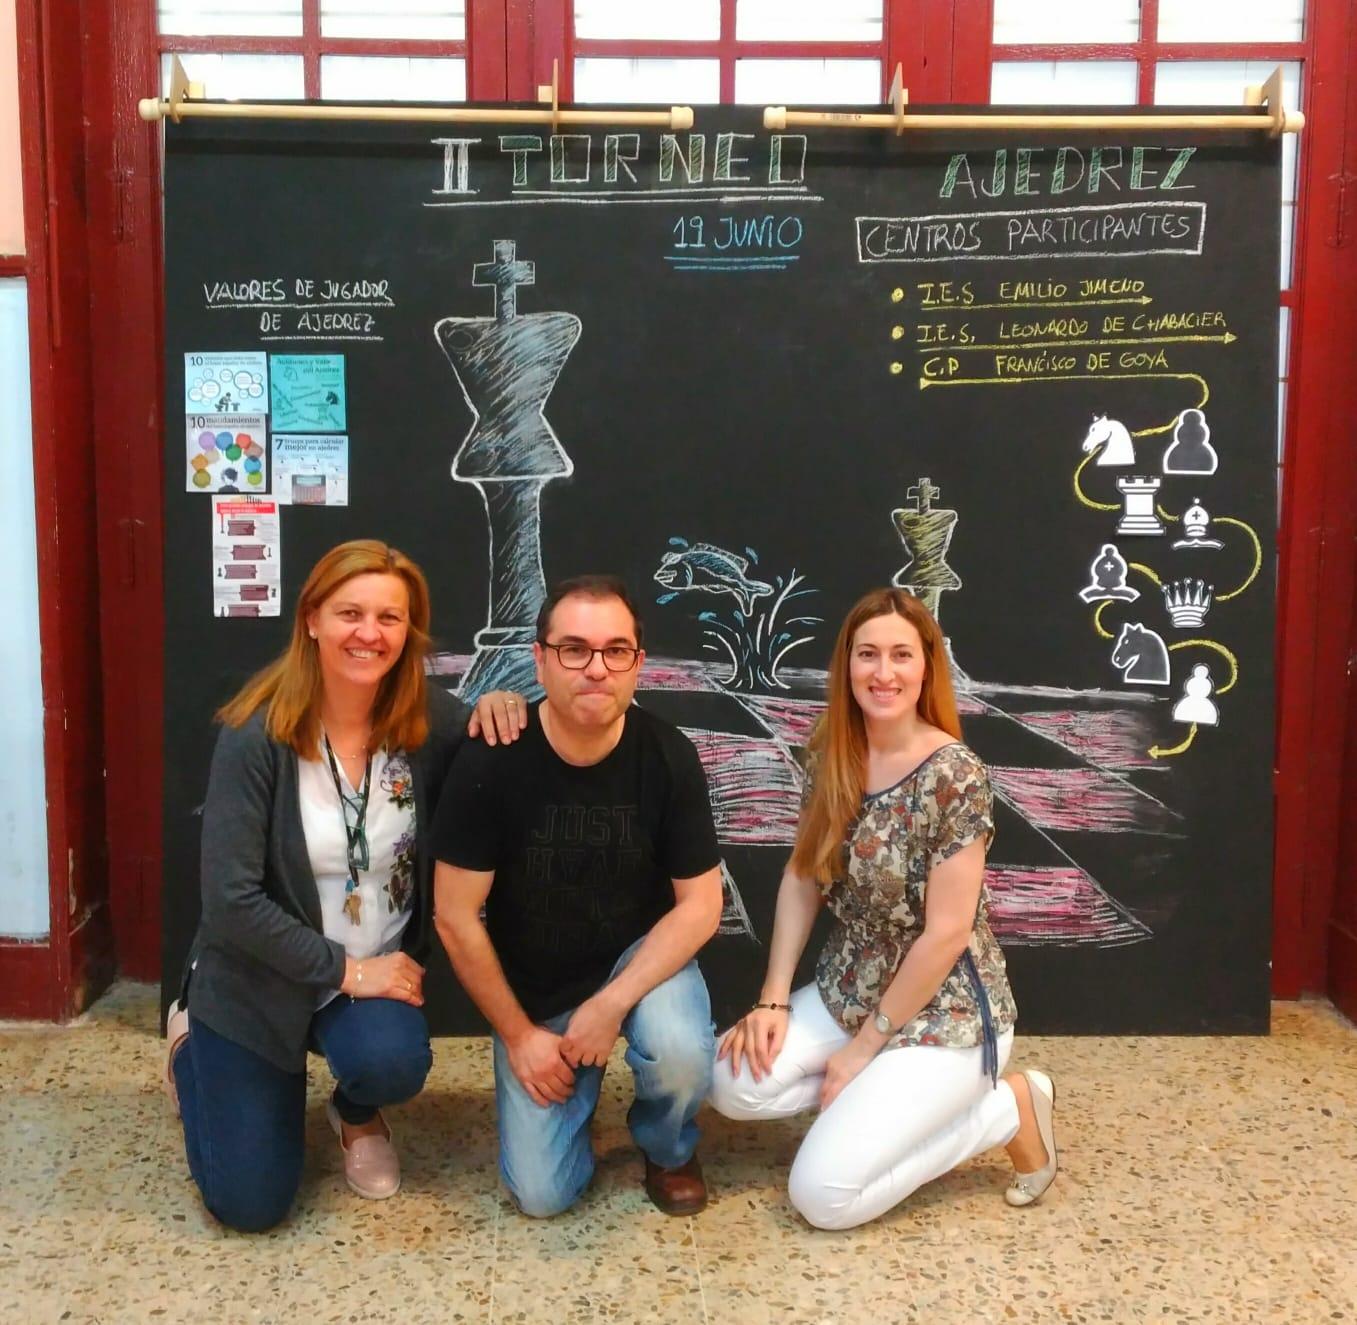 II TORNEO AJEDREZ INTERCENTROS DE CALATAYUD